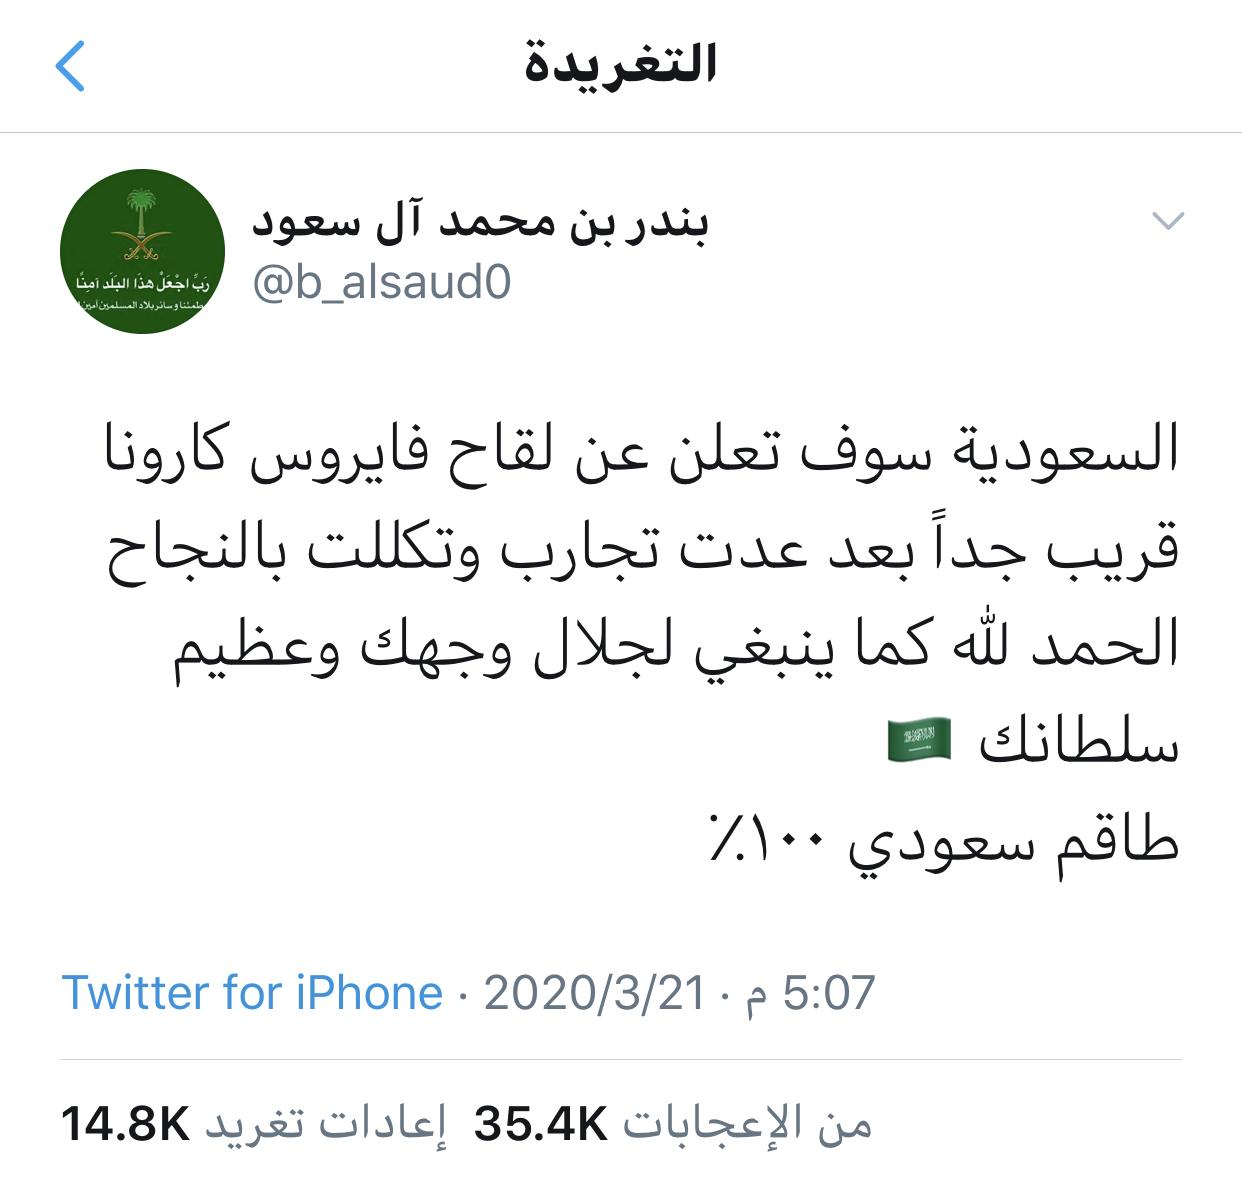 رد: الله اكبر (بشارة عن لقاح فايروس كارونا    طاقم سعودي 100%)